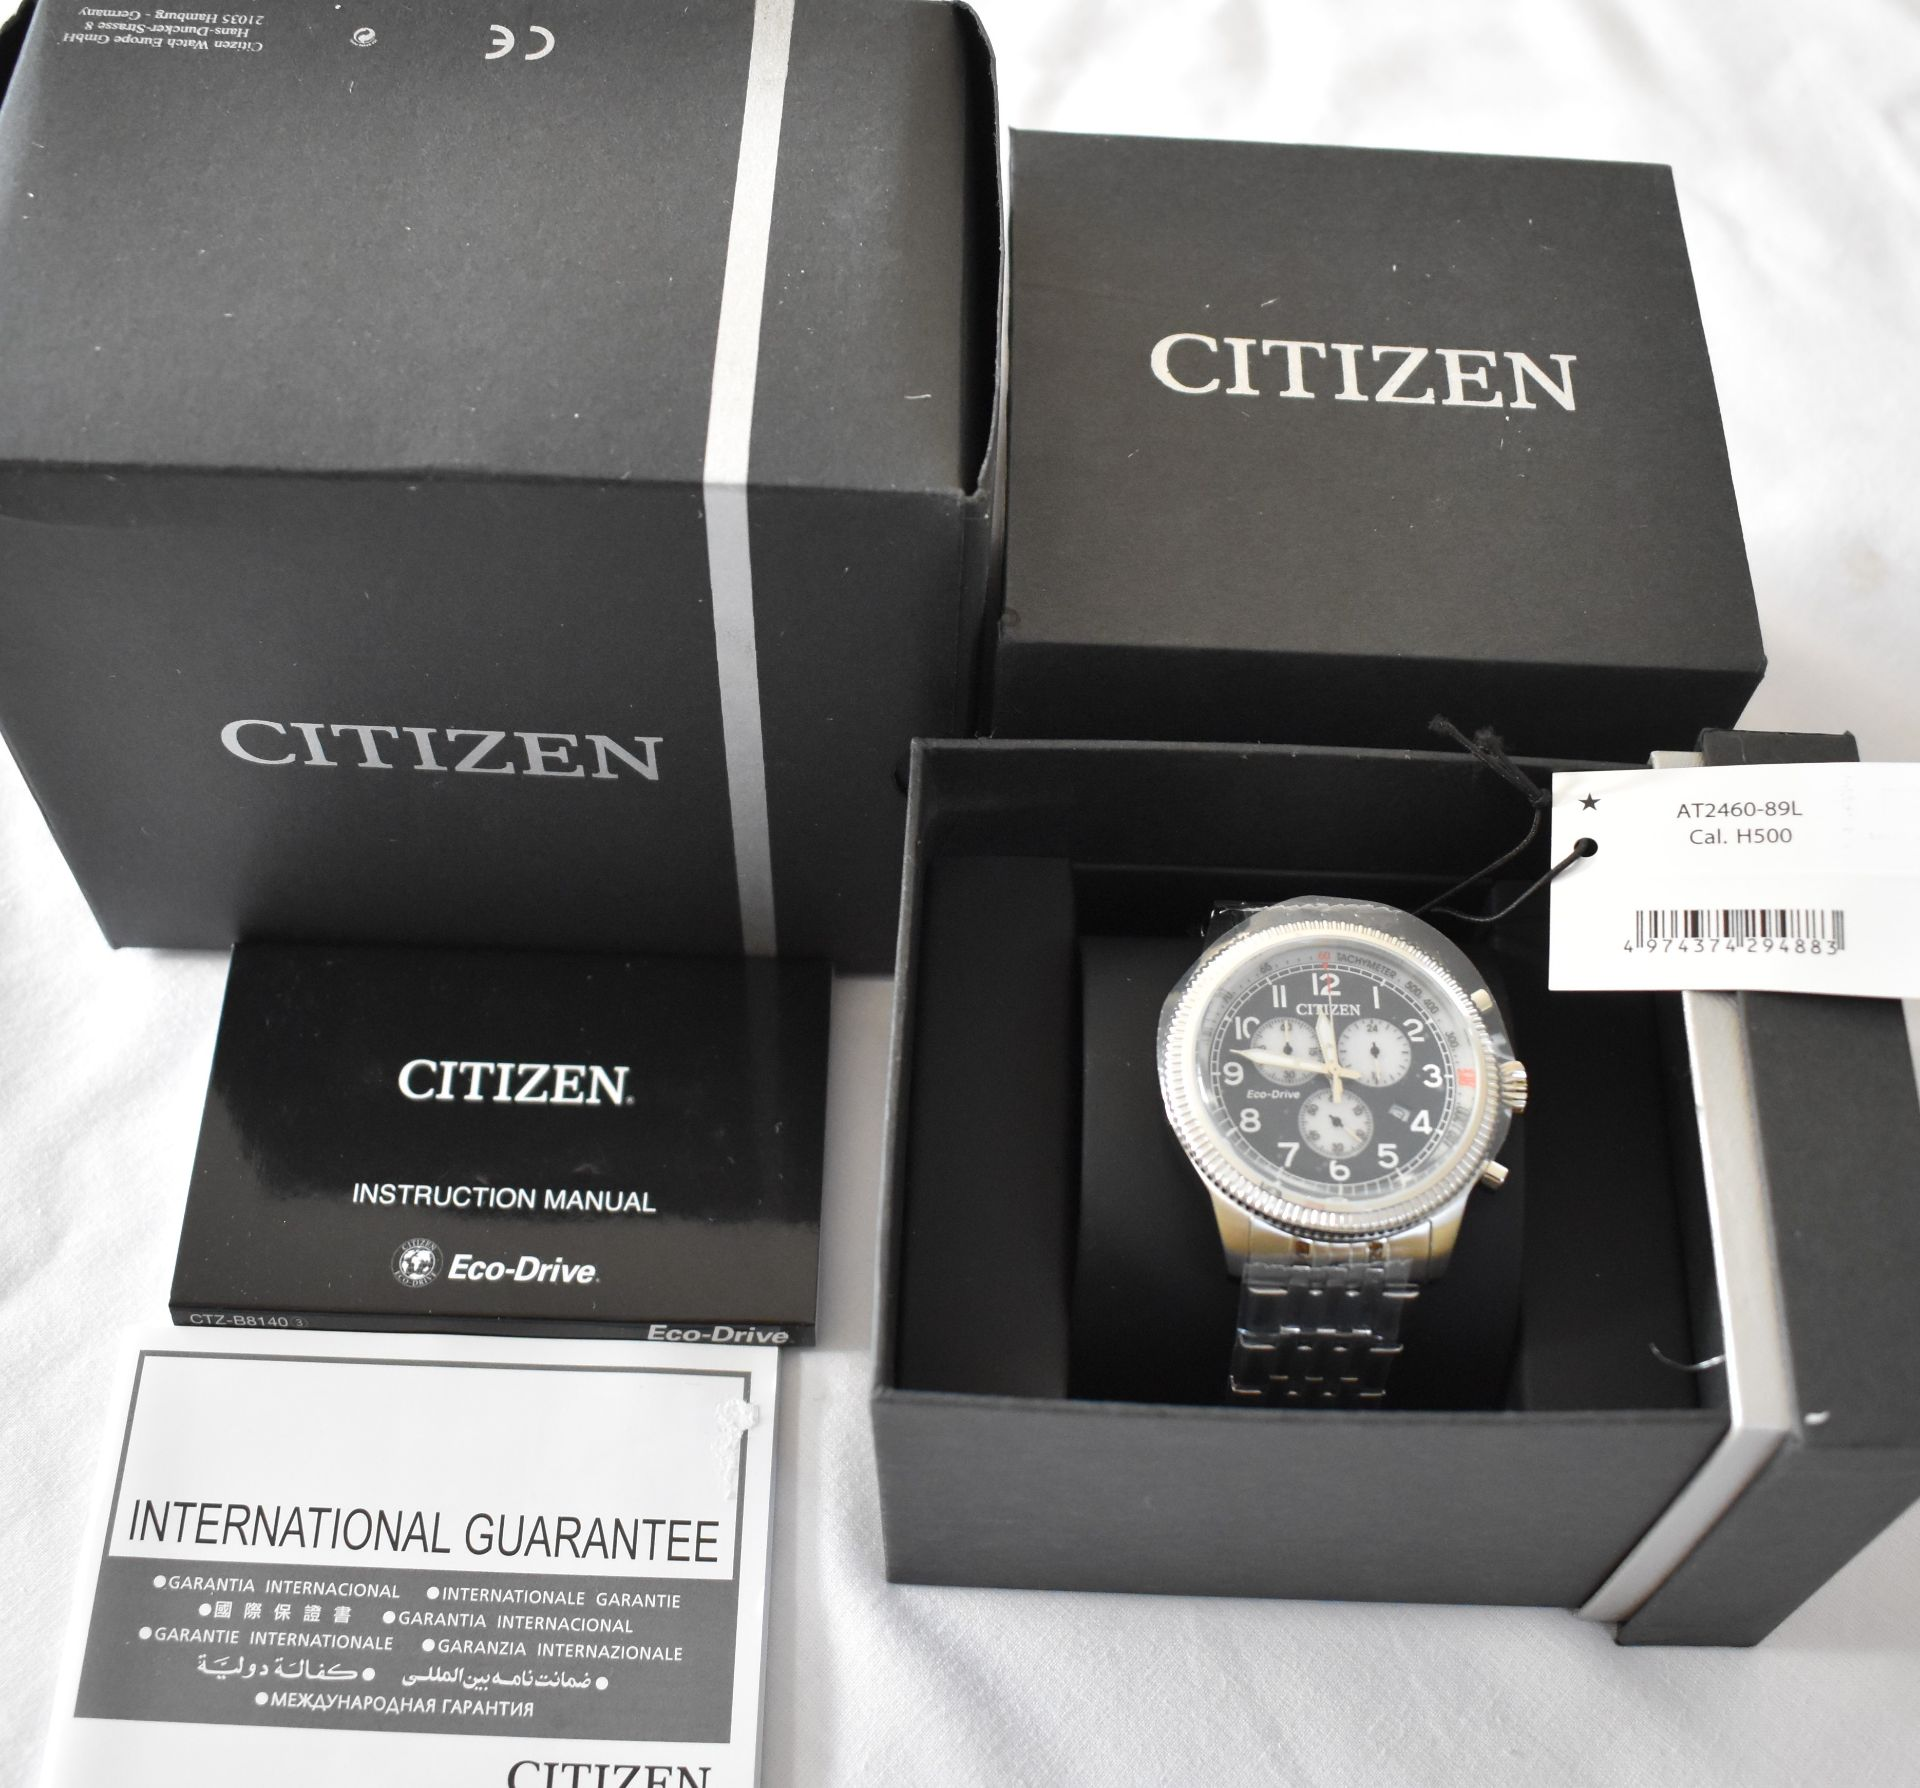 Citizen Men's Watch AT2460-89L